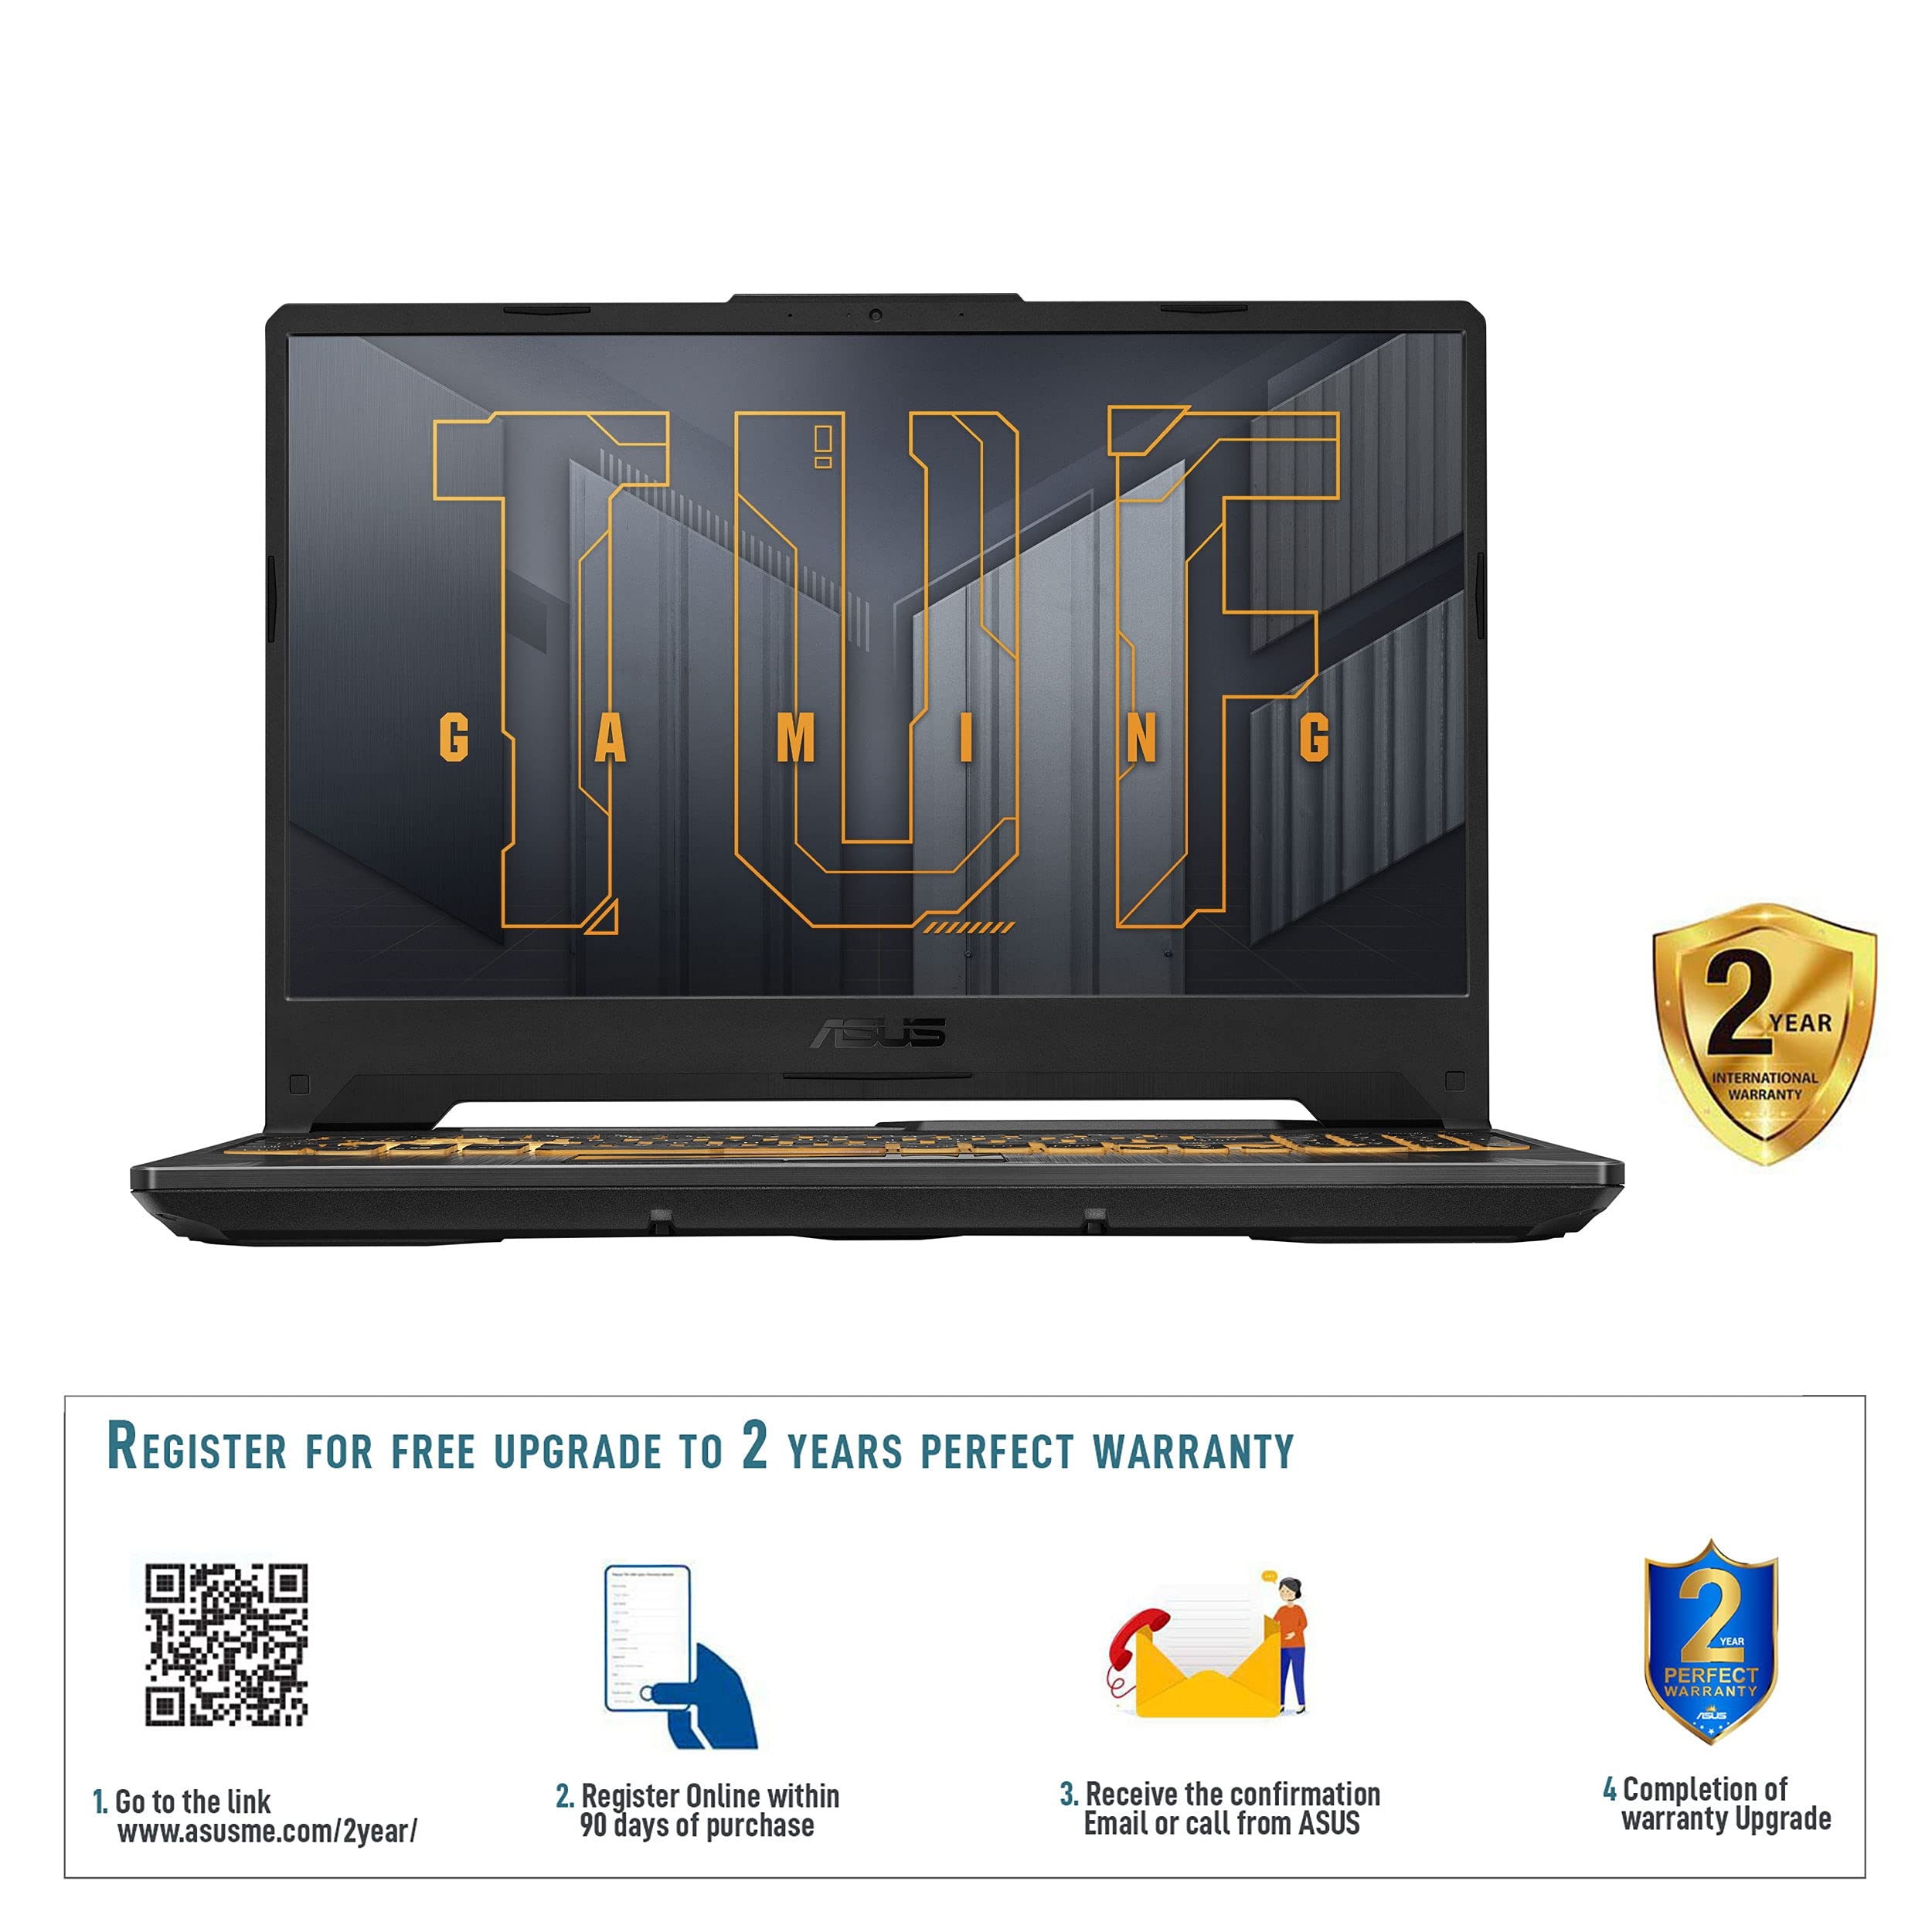 ASUS TUF Gaming F15 FX506HCB-HN1138T Eclipse Gray 6 Core 11th Gen Intel Core i5 CPU 2.7GHz, 8GB RAM, 512GB SSD, NVIDIA GeForce RTX3050, 15.6''FHD 144Hz, HD Webcam, Win10, Backlit-Eng-Arb-KB.